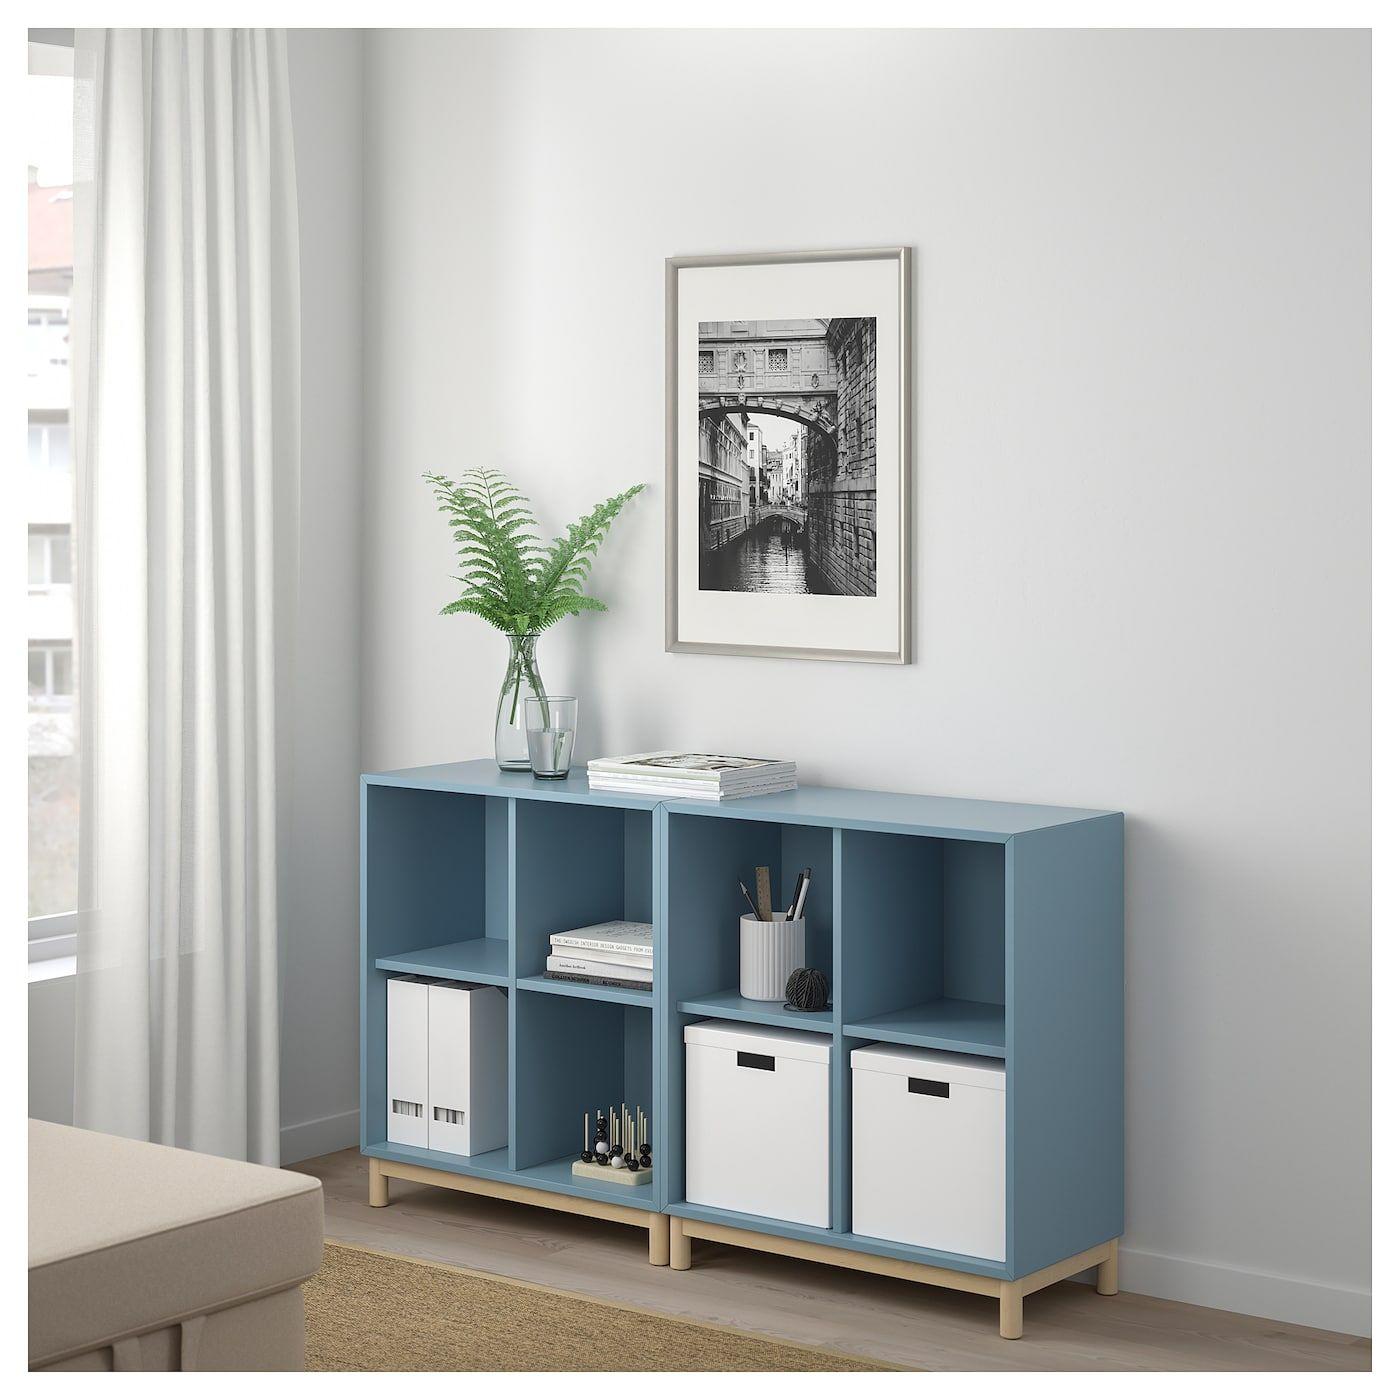 Ikea Us Furniture And Home Furnishings Storage Boxes With Lids Eket Ikea